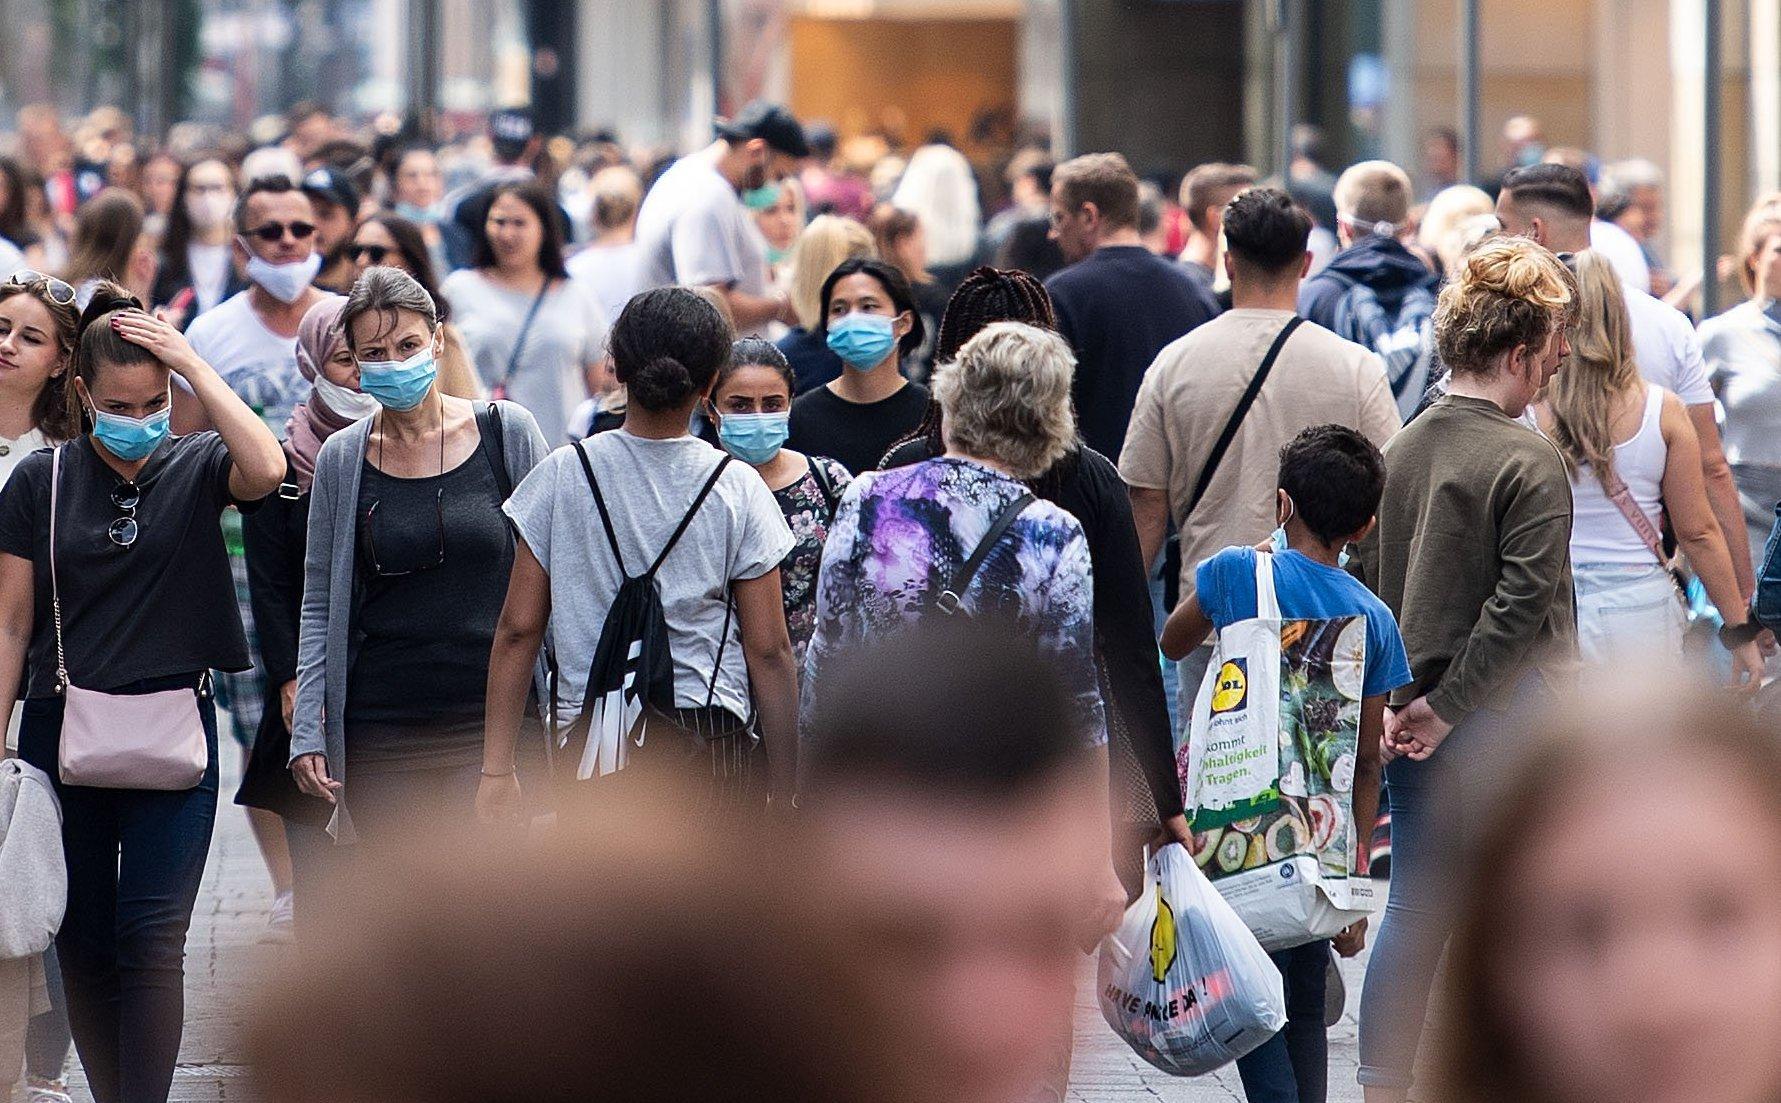 Fallzahlen bleiben hoch: 870 neue Corona-Infektionen